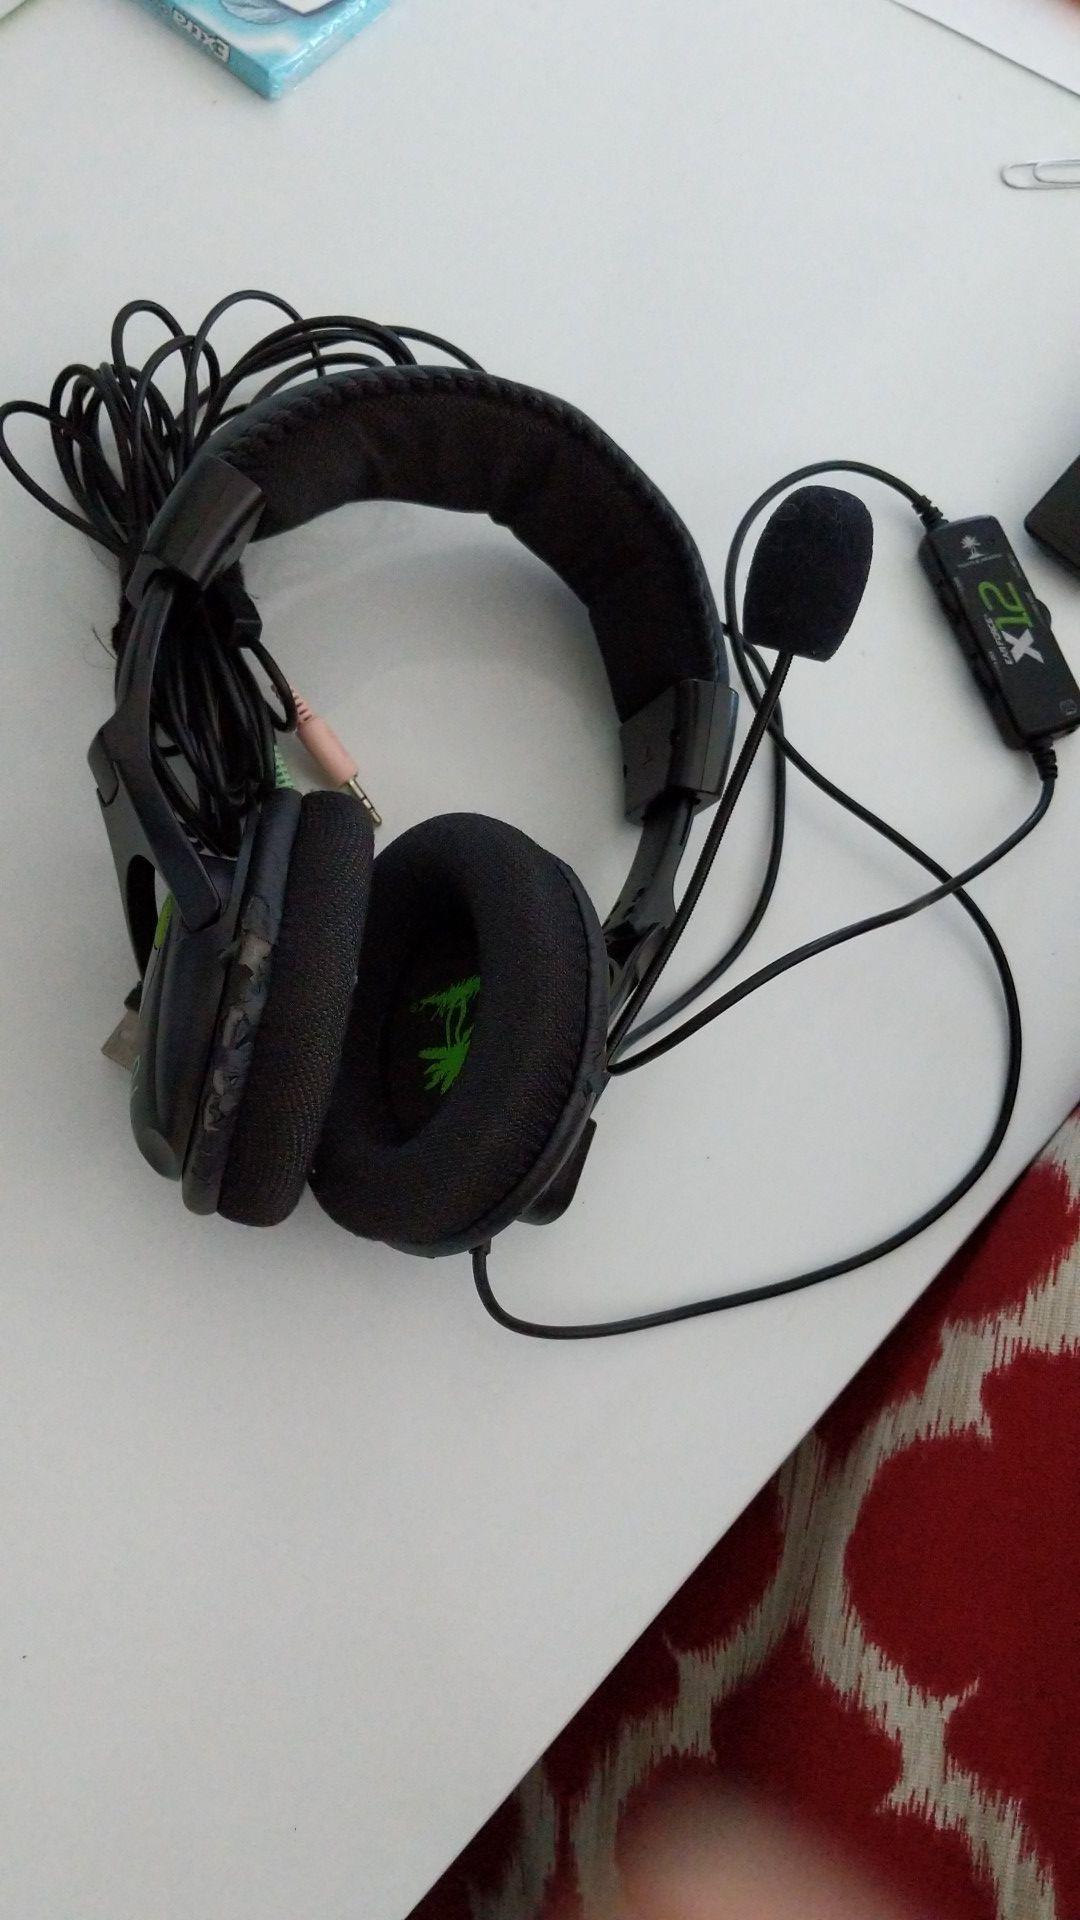 Turtle Beach X12 Gaming Headphones